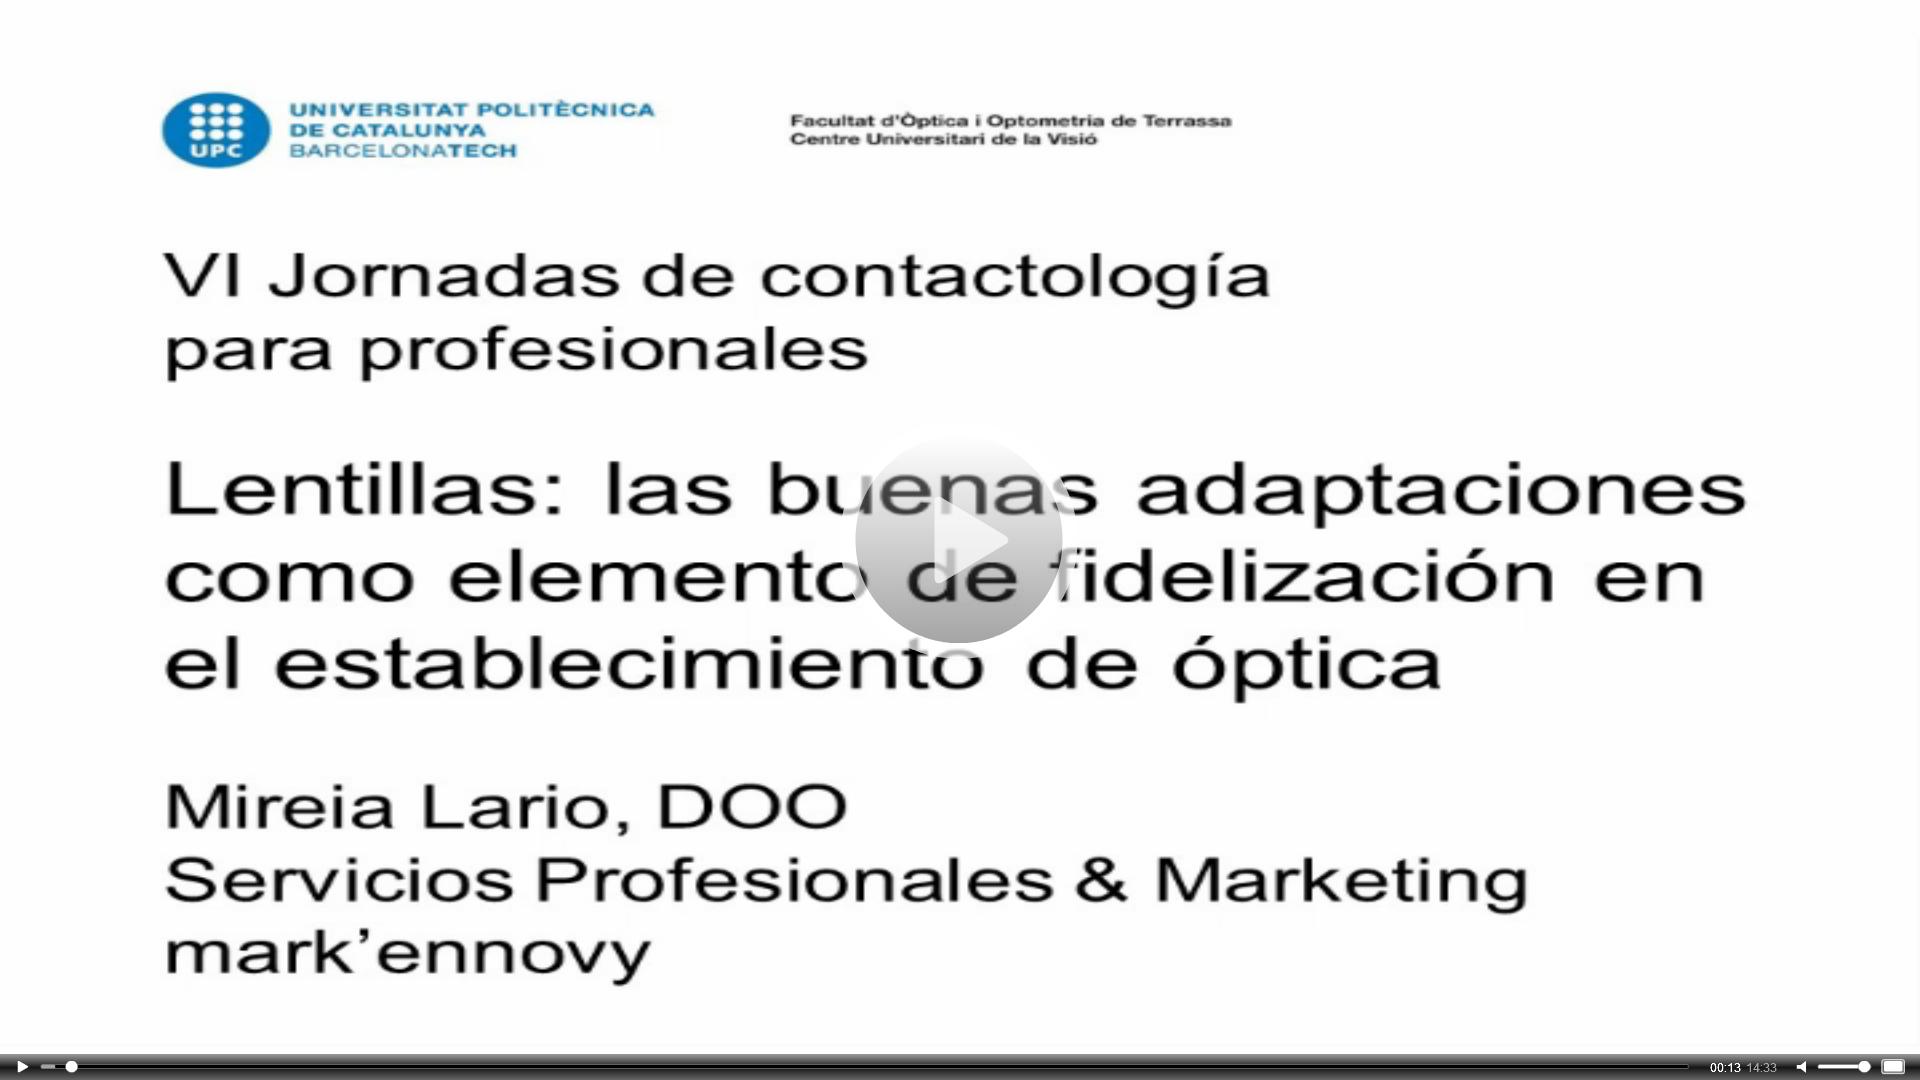 JLC2015_adaptacion_fidelizacion(Mireia_Lario-markennovy)